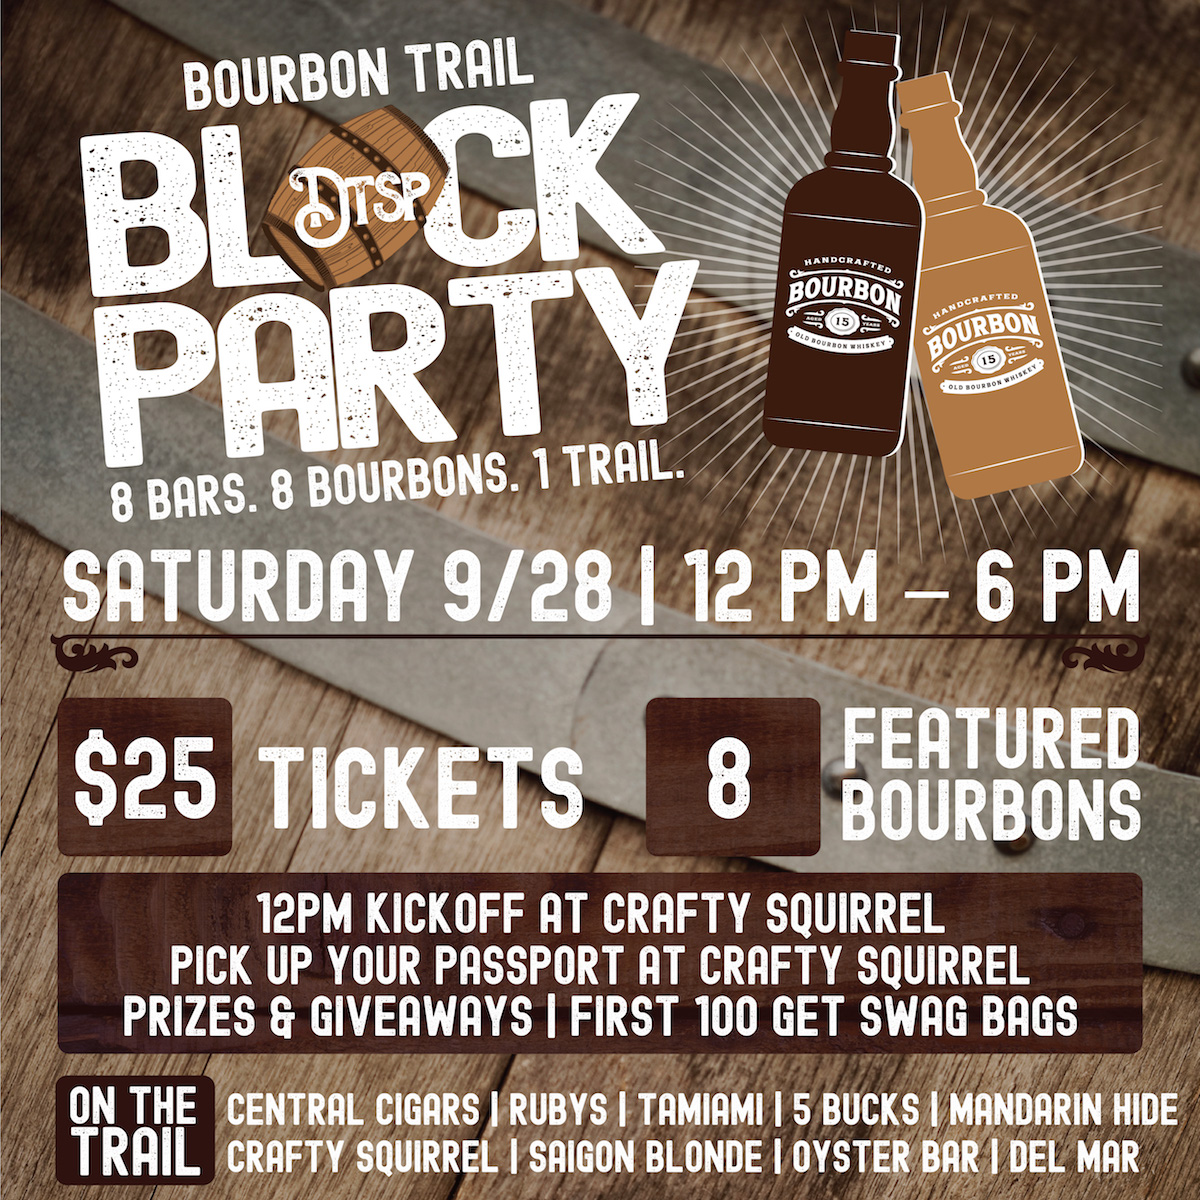 DTSPBlock_BourbonTrail